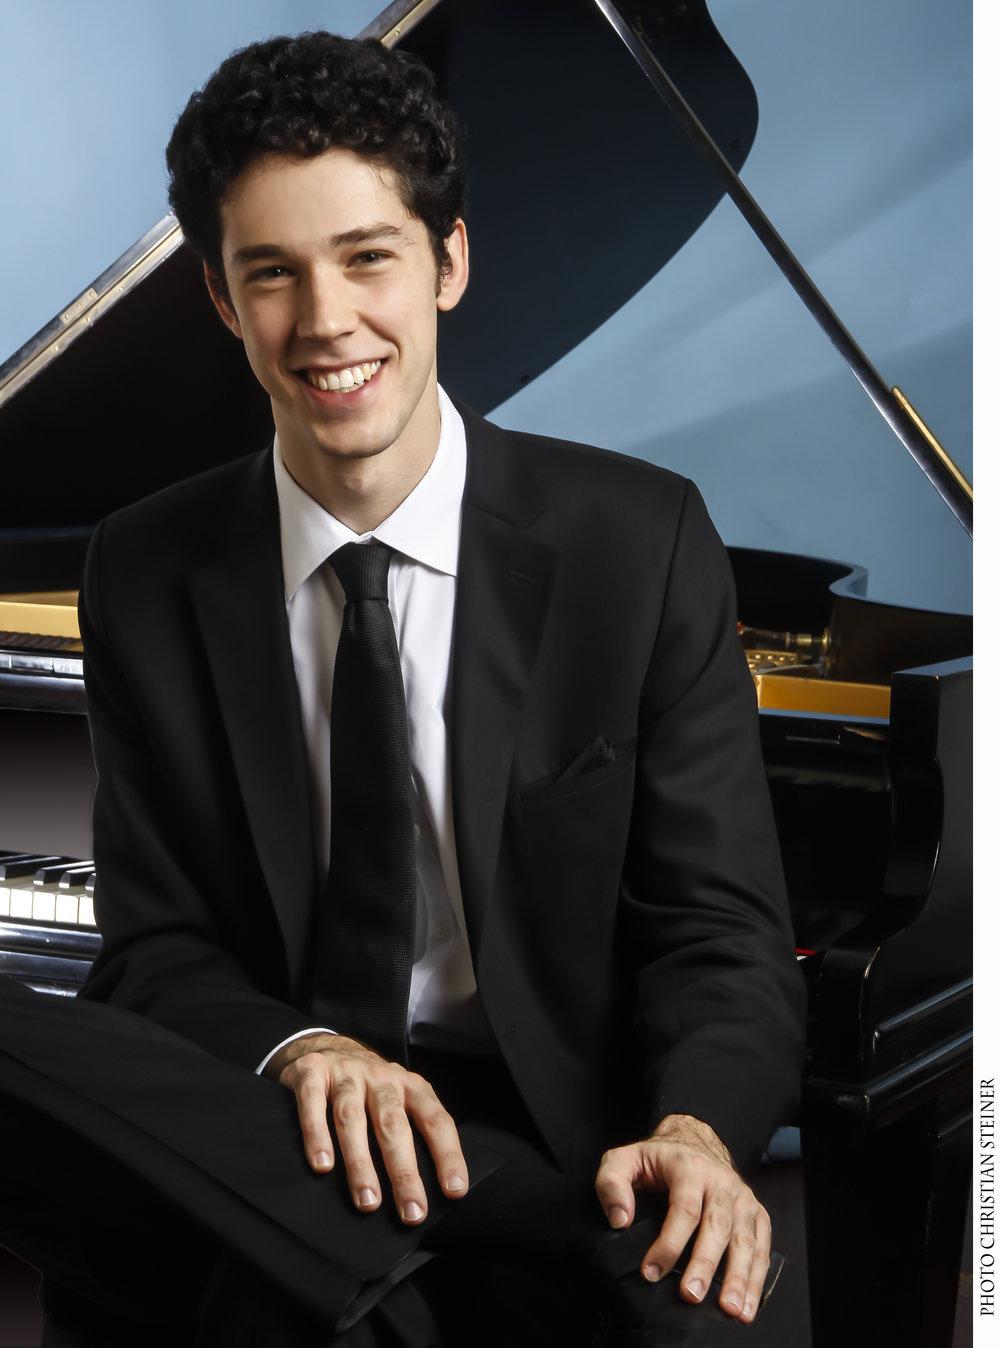 Tomer Gewirtzman - October 9: Medtner and ScriabinOctober 30: Beethoven and Brahms